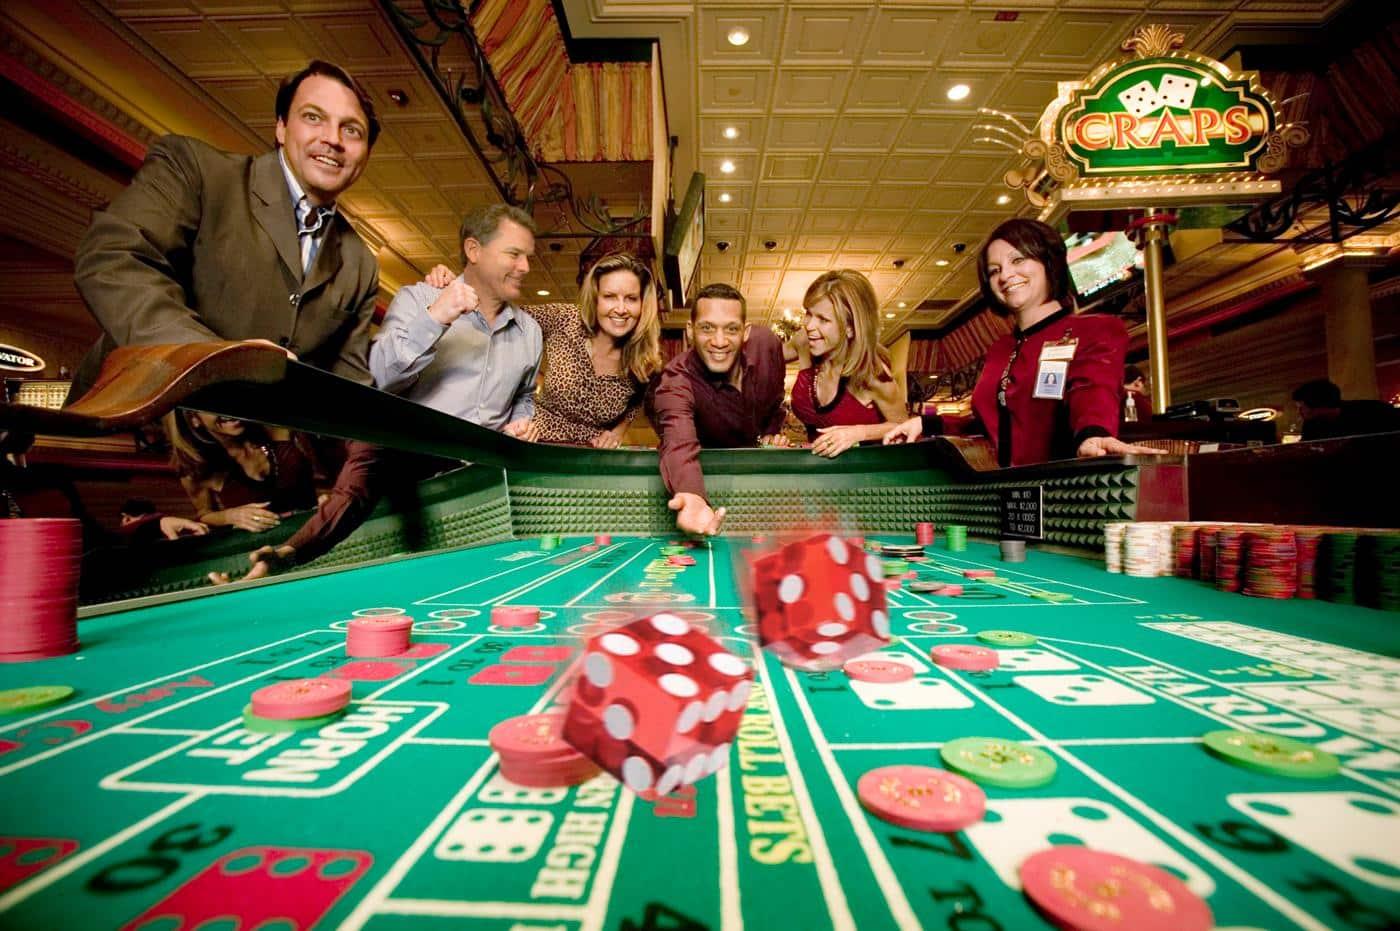 Augmenter sa chance avec academie poker liegeois